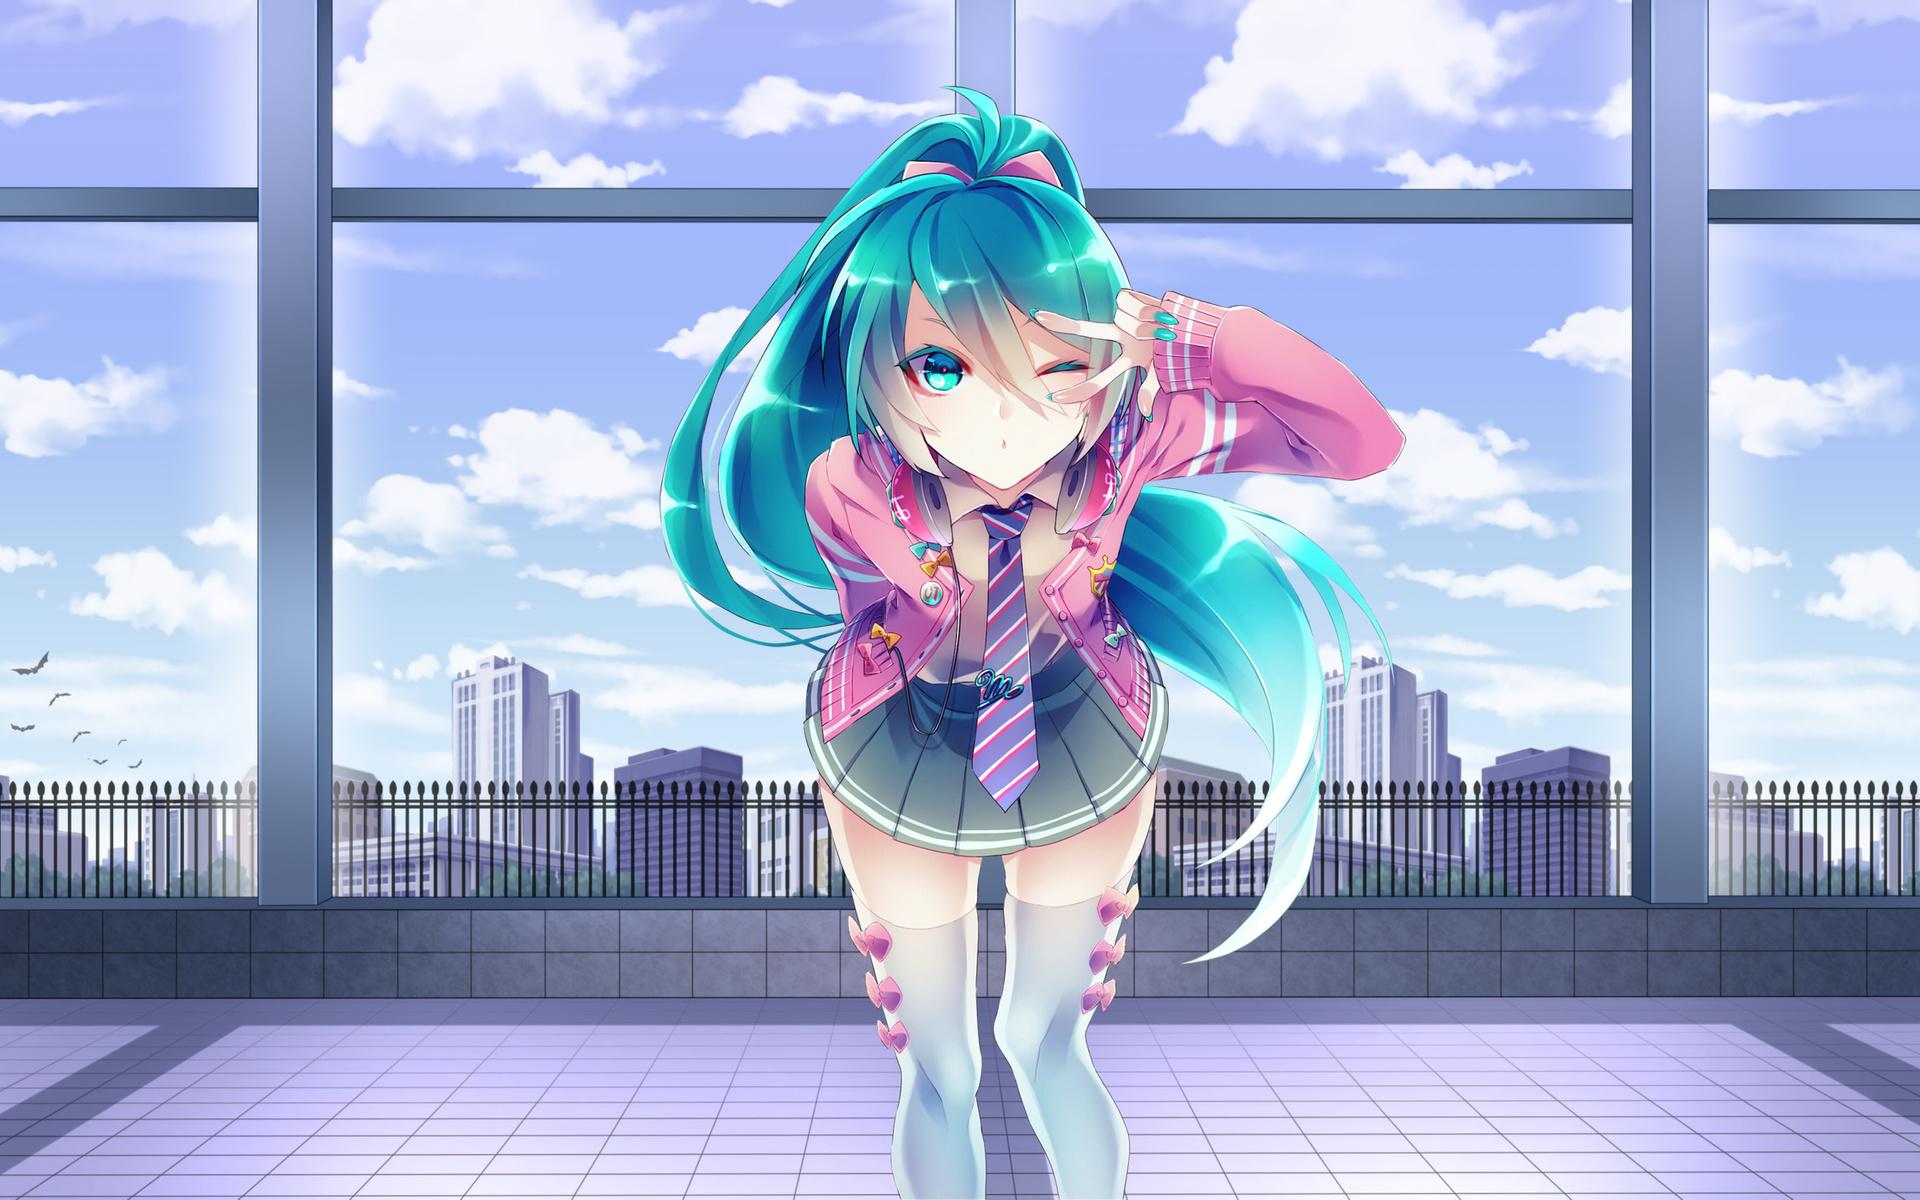 hatsune miku, vocaloid, girl, anime